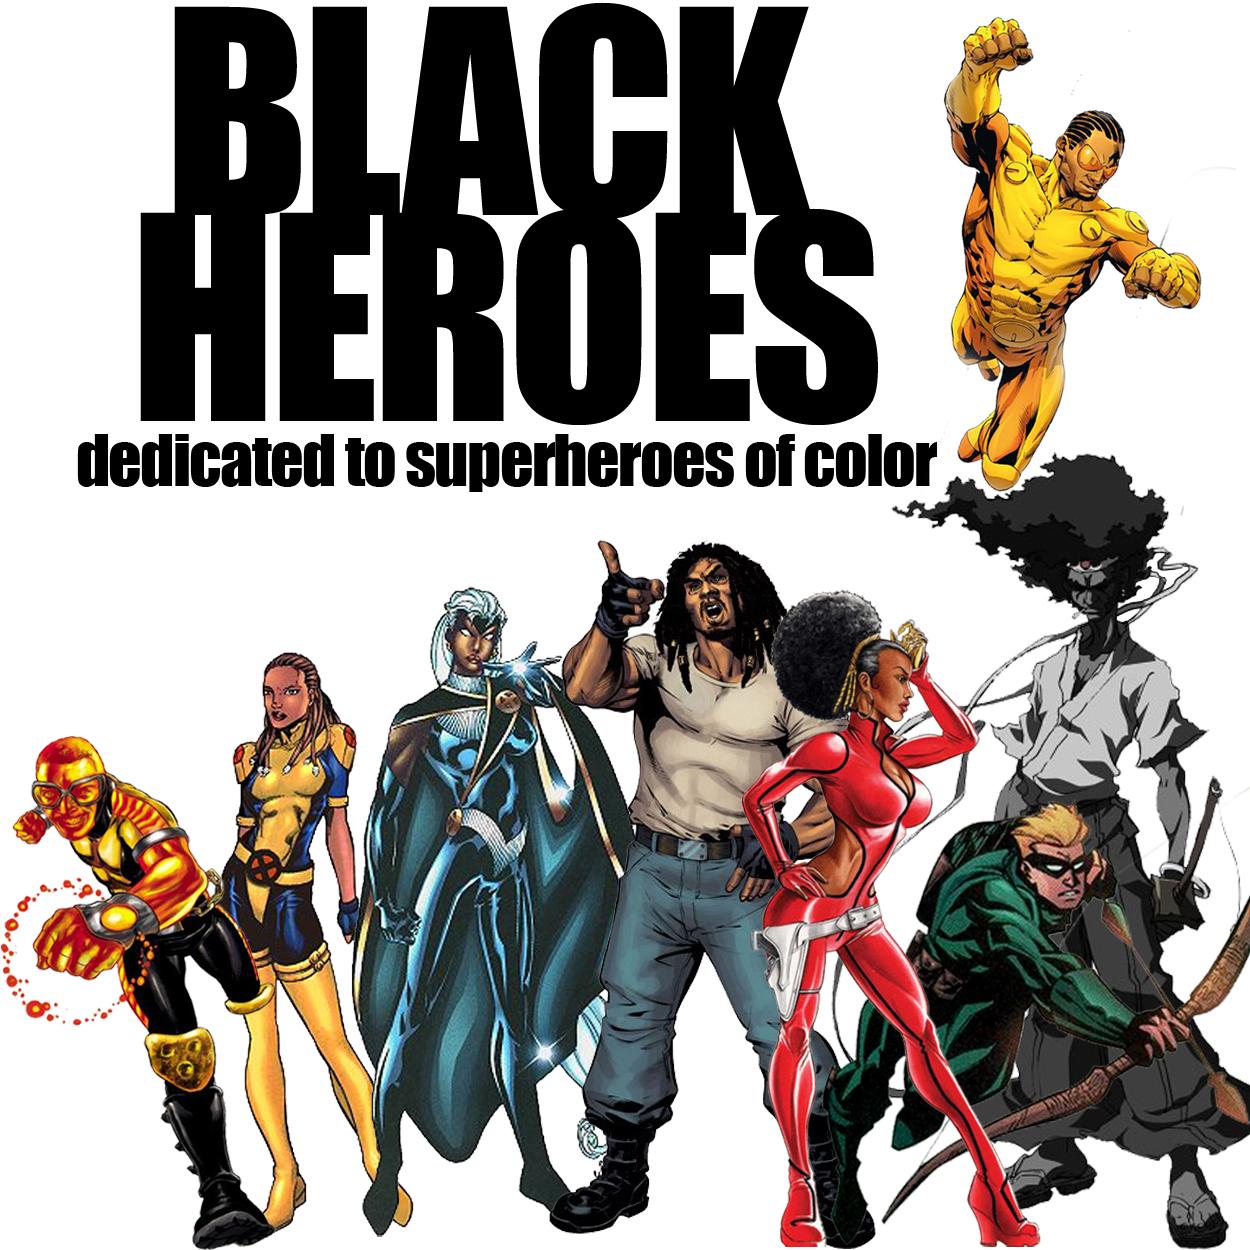 worldofblackheroes dedicated to black superhero news